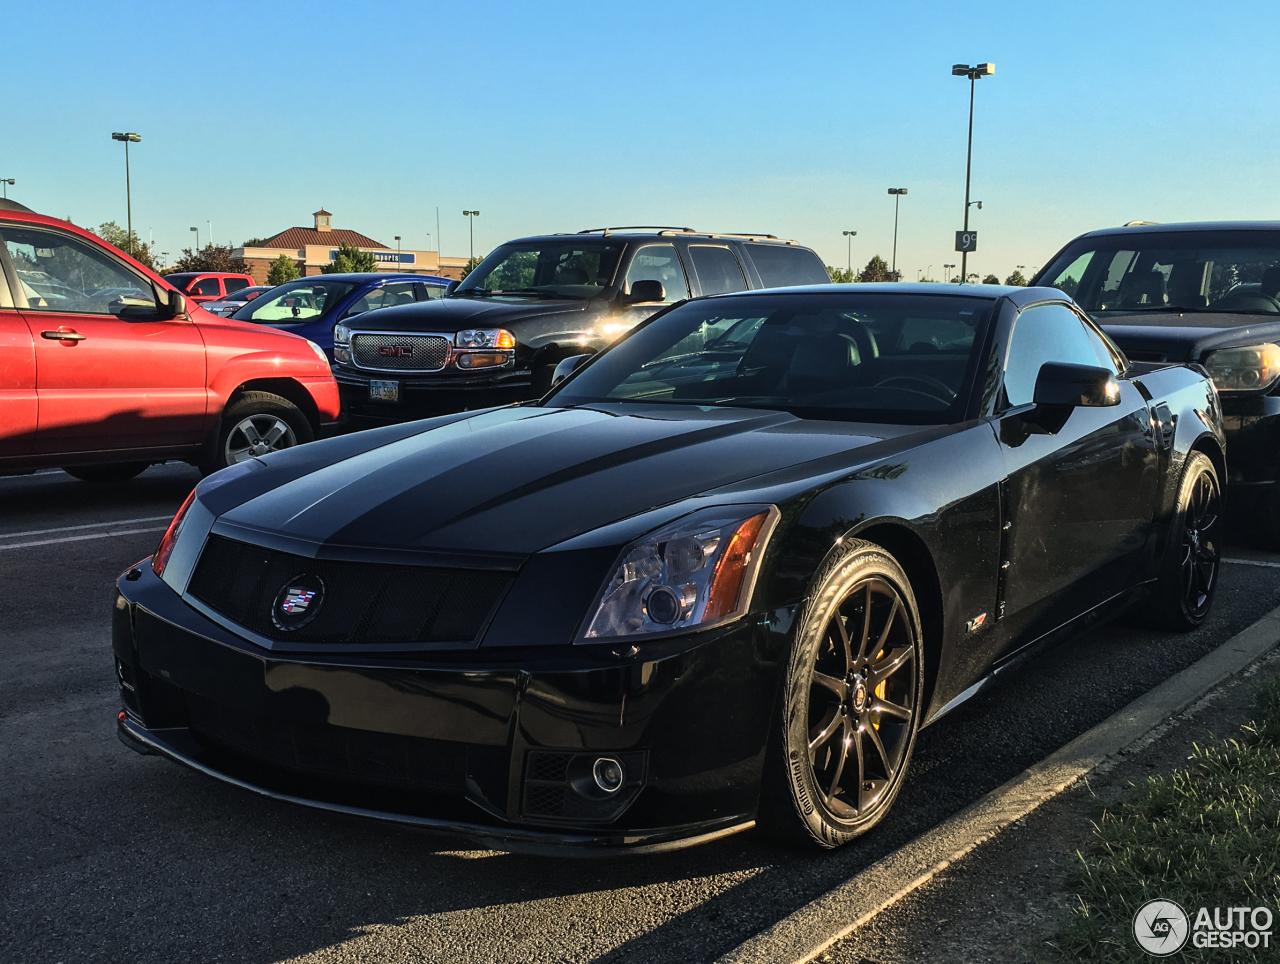 Cadillac XLR-V - 28 June 2016 - Autogespot